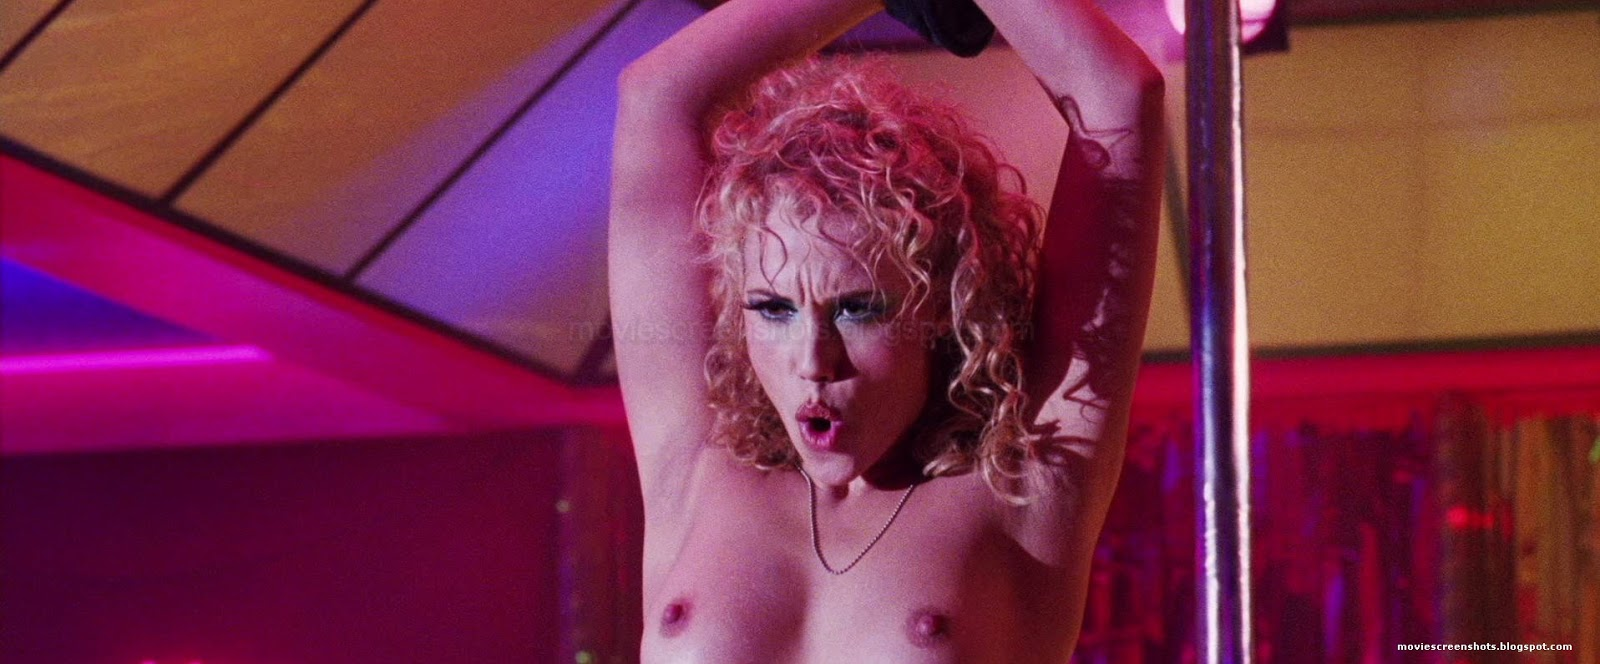 Grainofsandx jasmin live celebrity naked photo